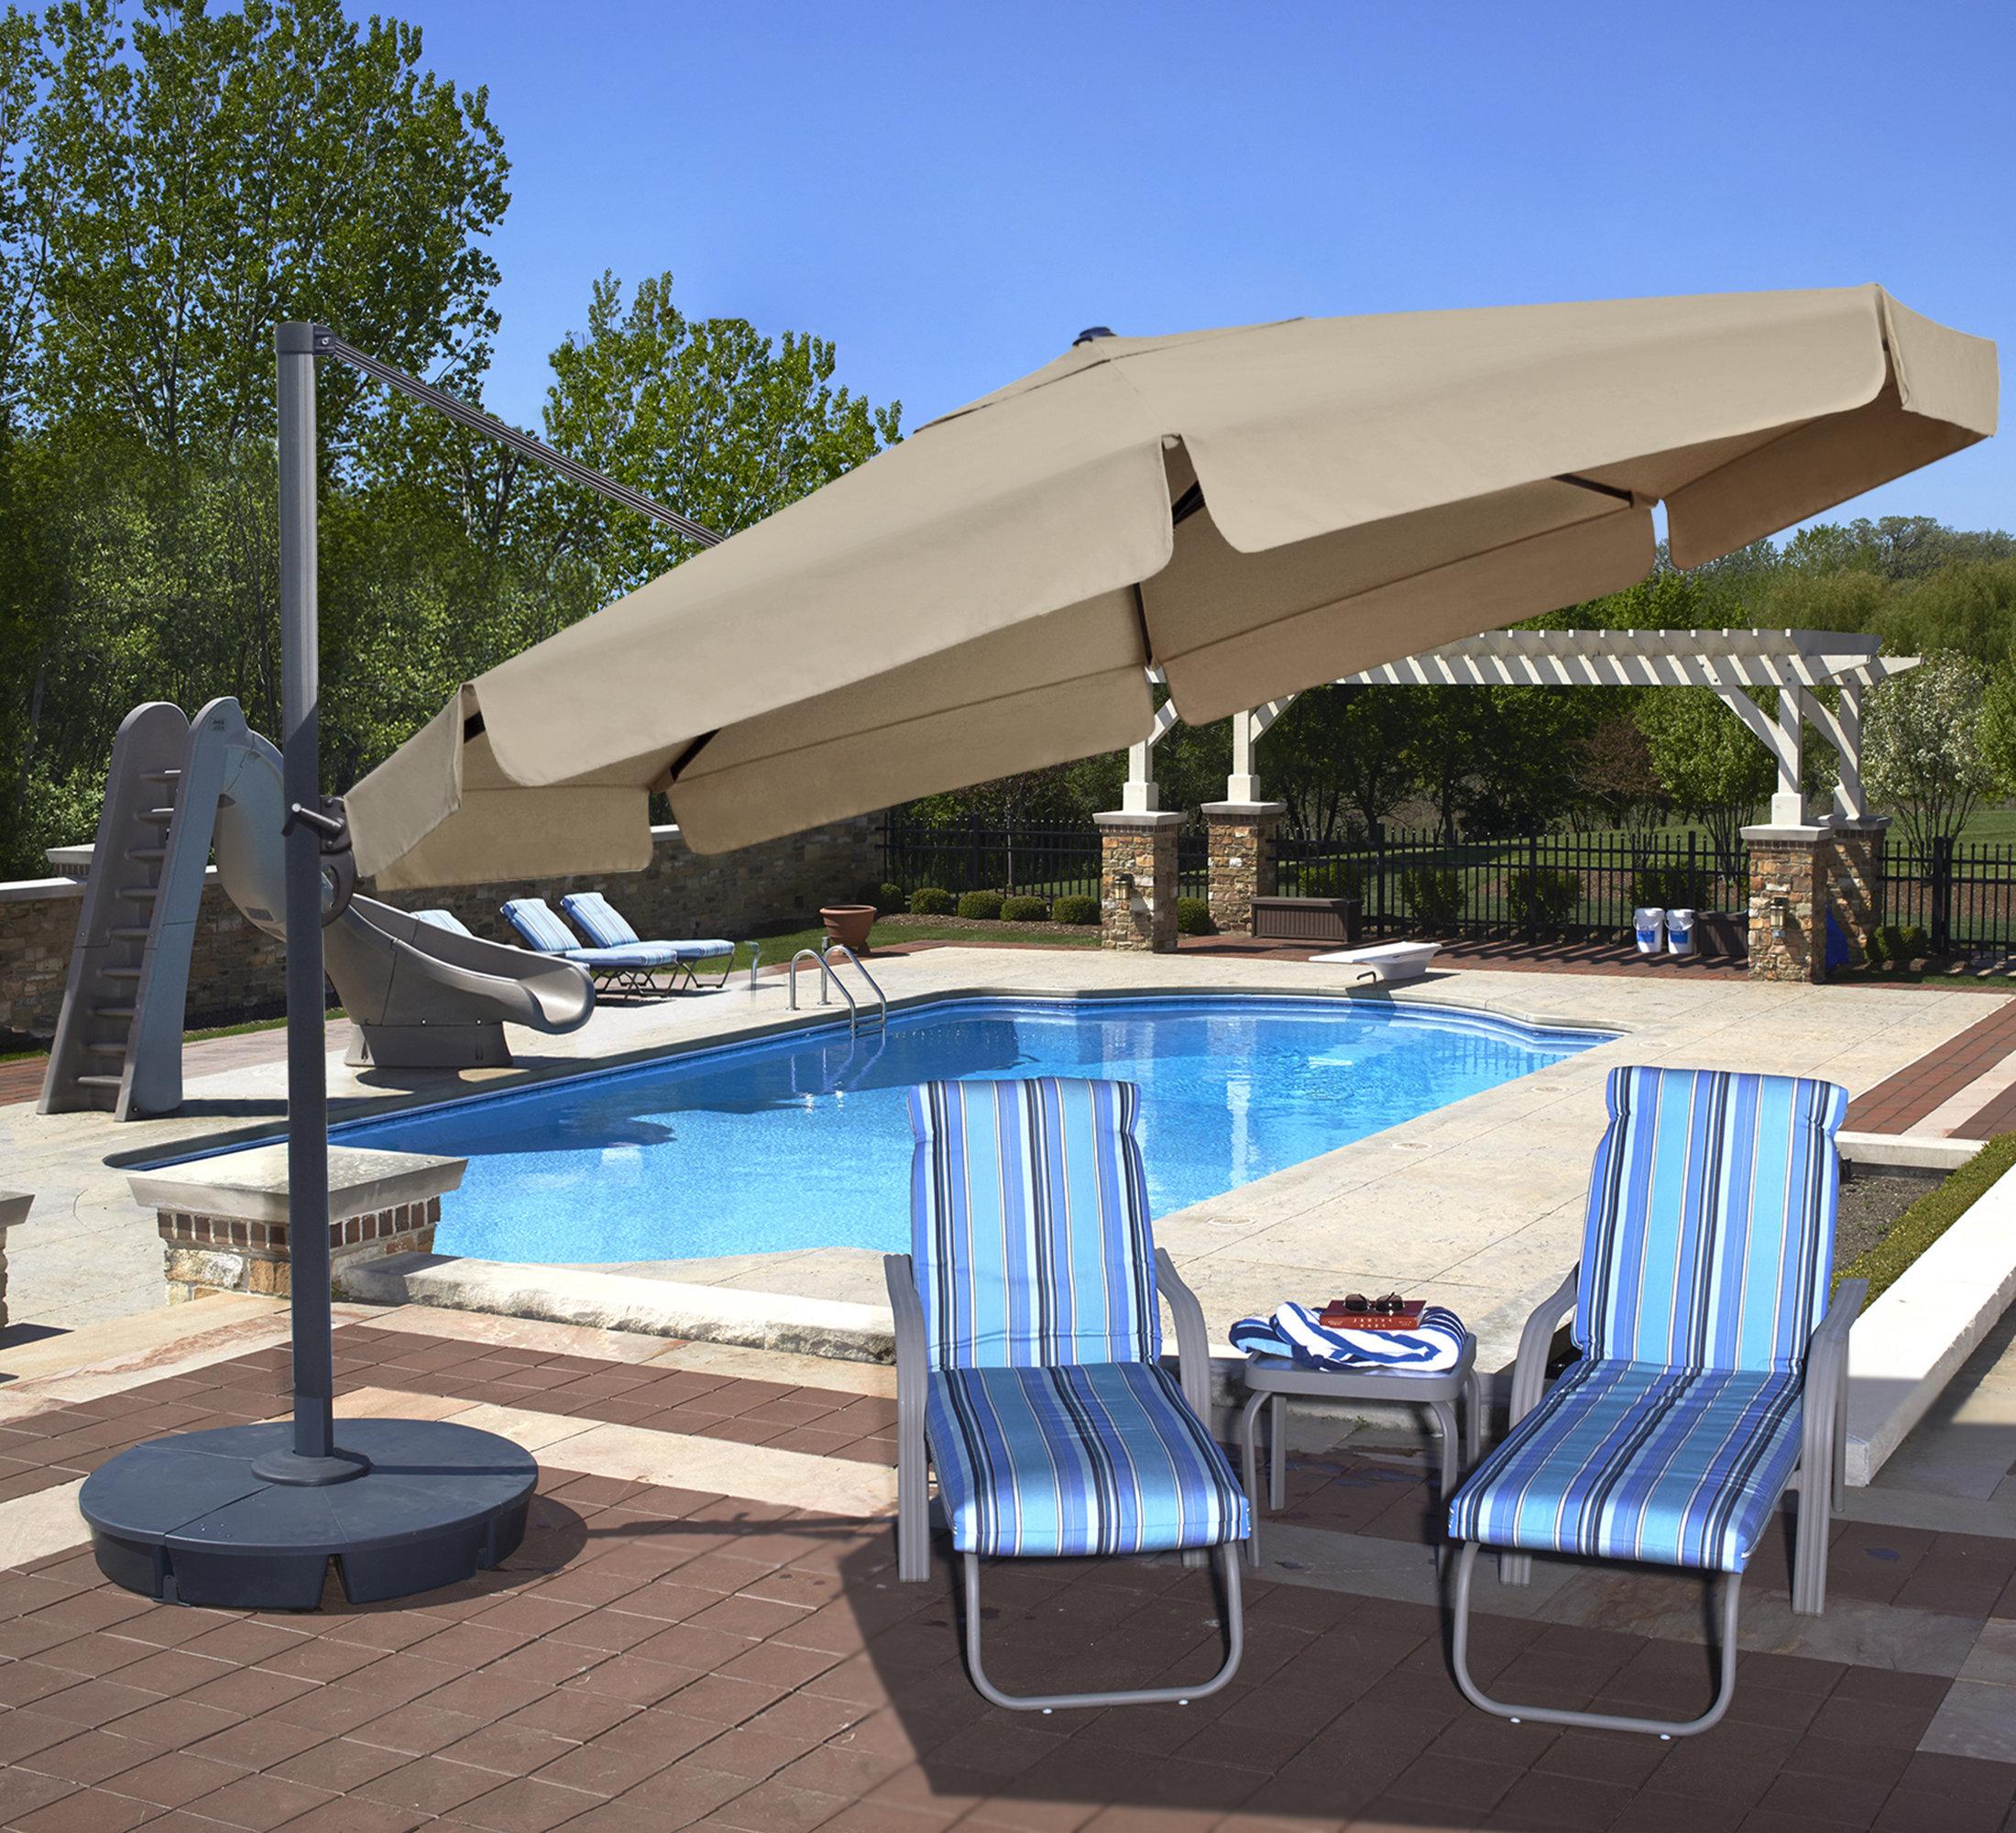 Lennie 13' Cantilever Sunbrella Umbrella Regarding Well Liked Voss Cantilever Sunbrella Umbrellas (View 9 of 20)